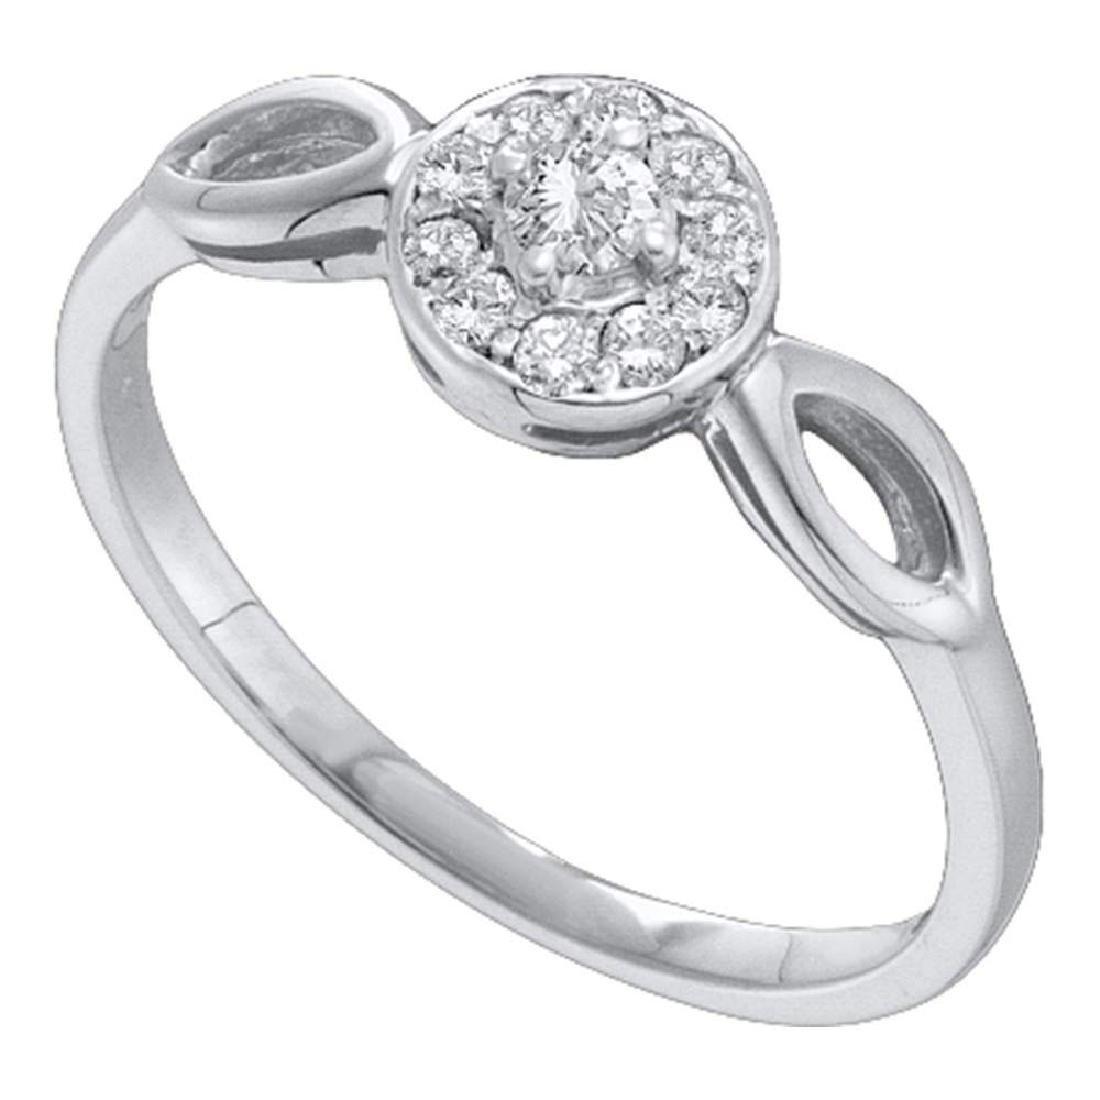 10k White Gold Round Diamond Solitaire Promise Bridal E